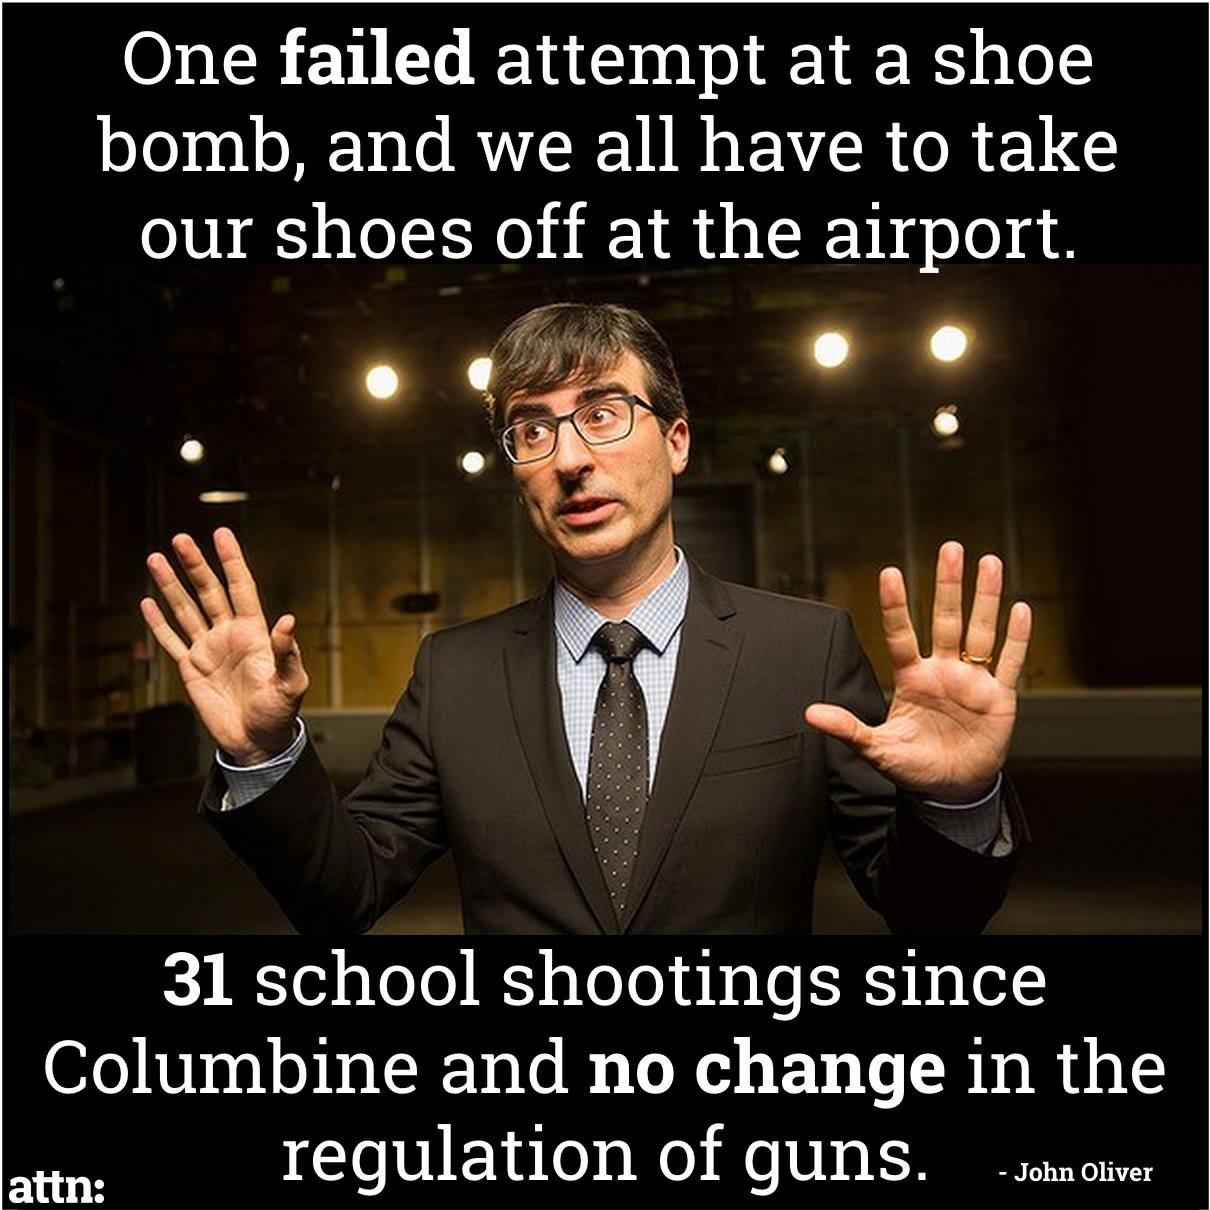 This John Oliver Meme on Gun Control Says It All